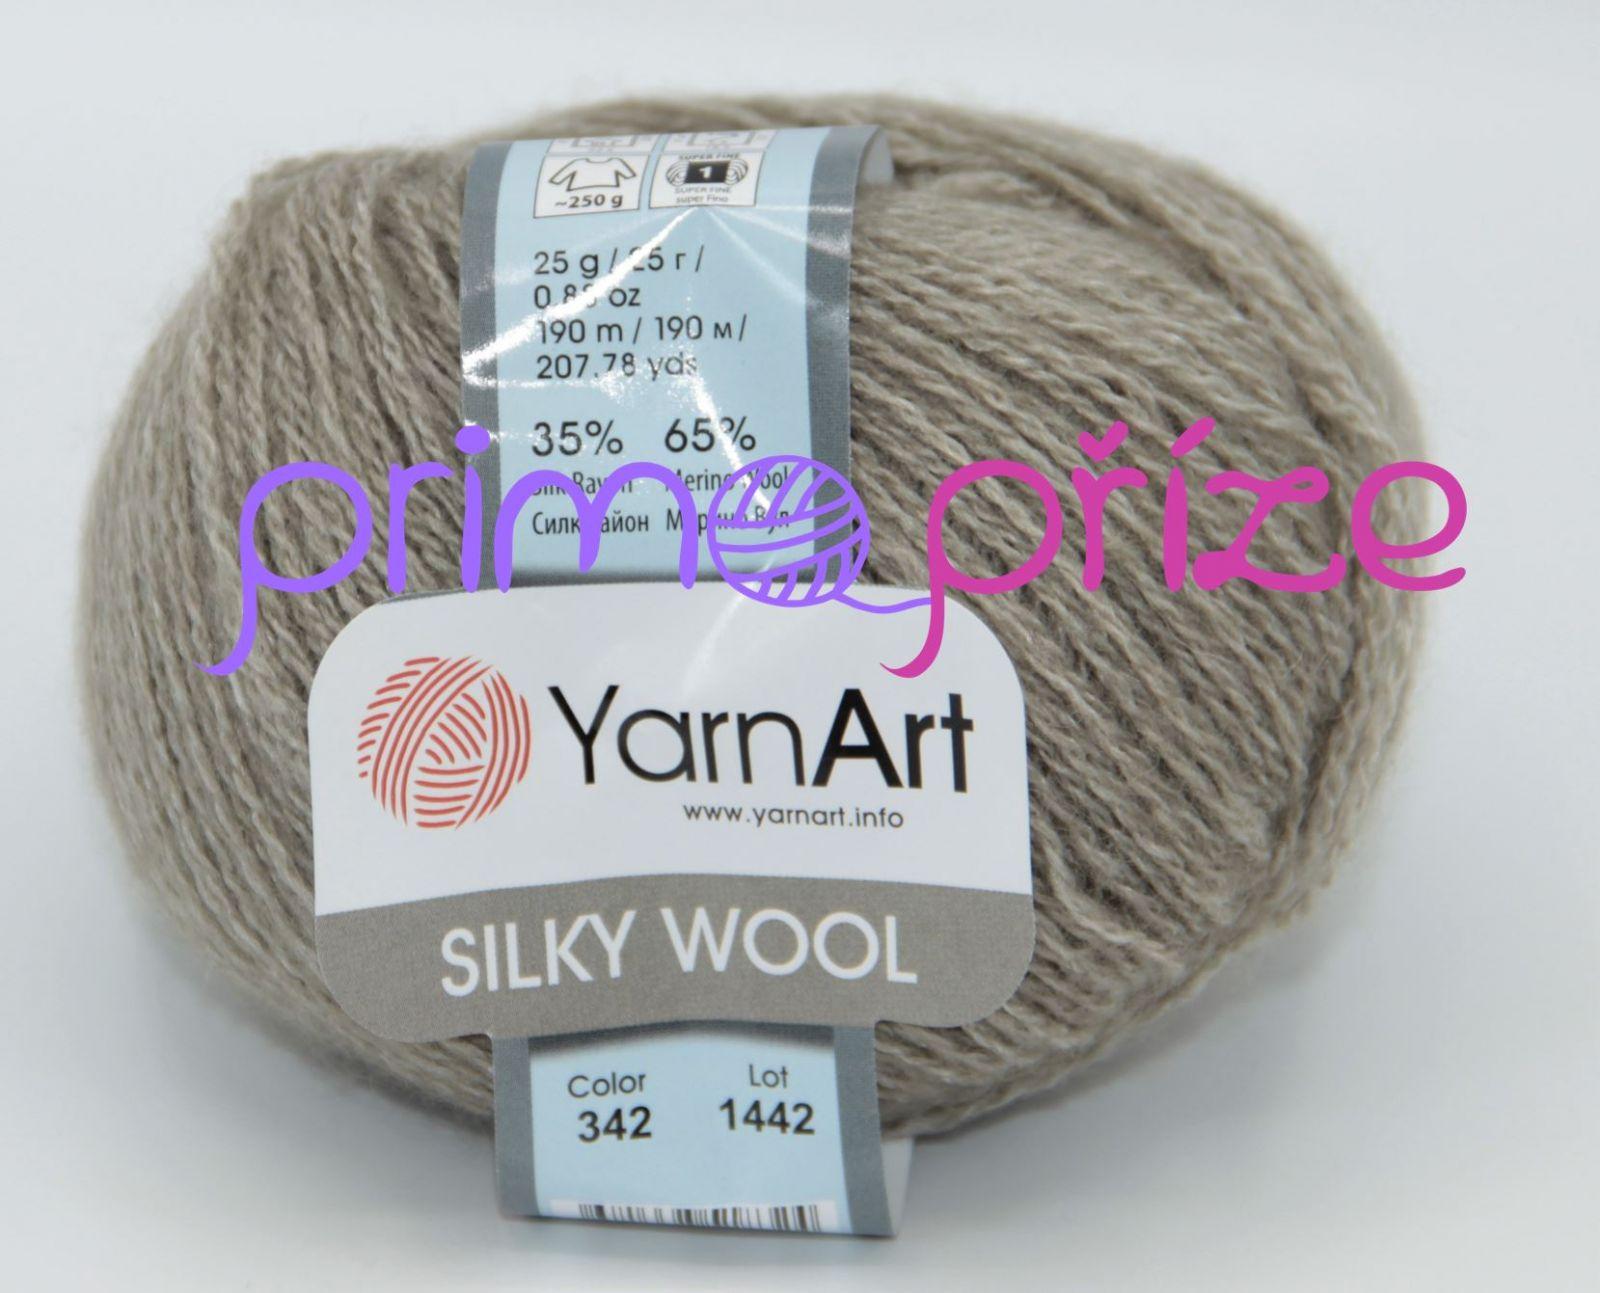 YarnArt Silky Wool 342 šedohnědá